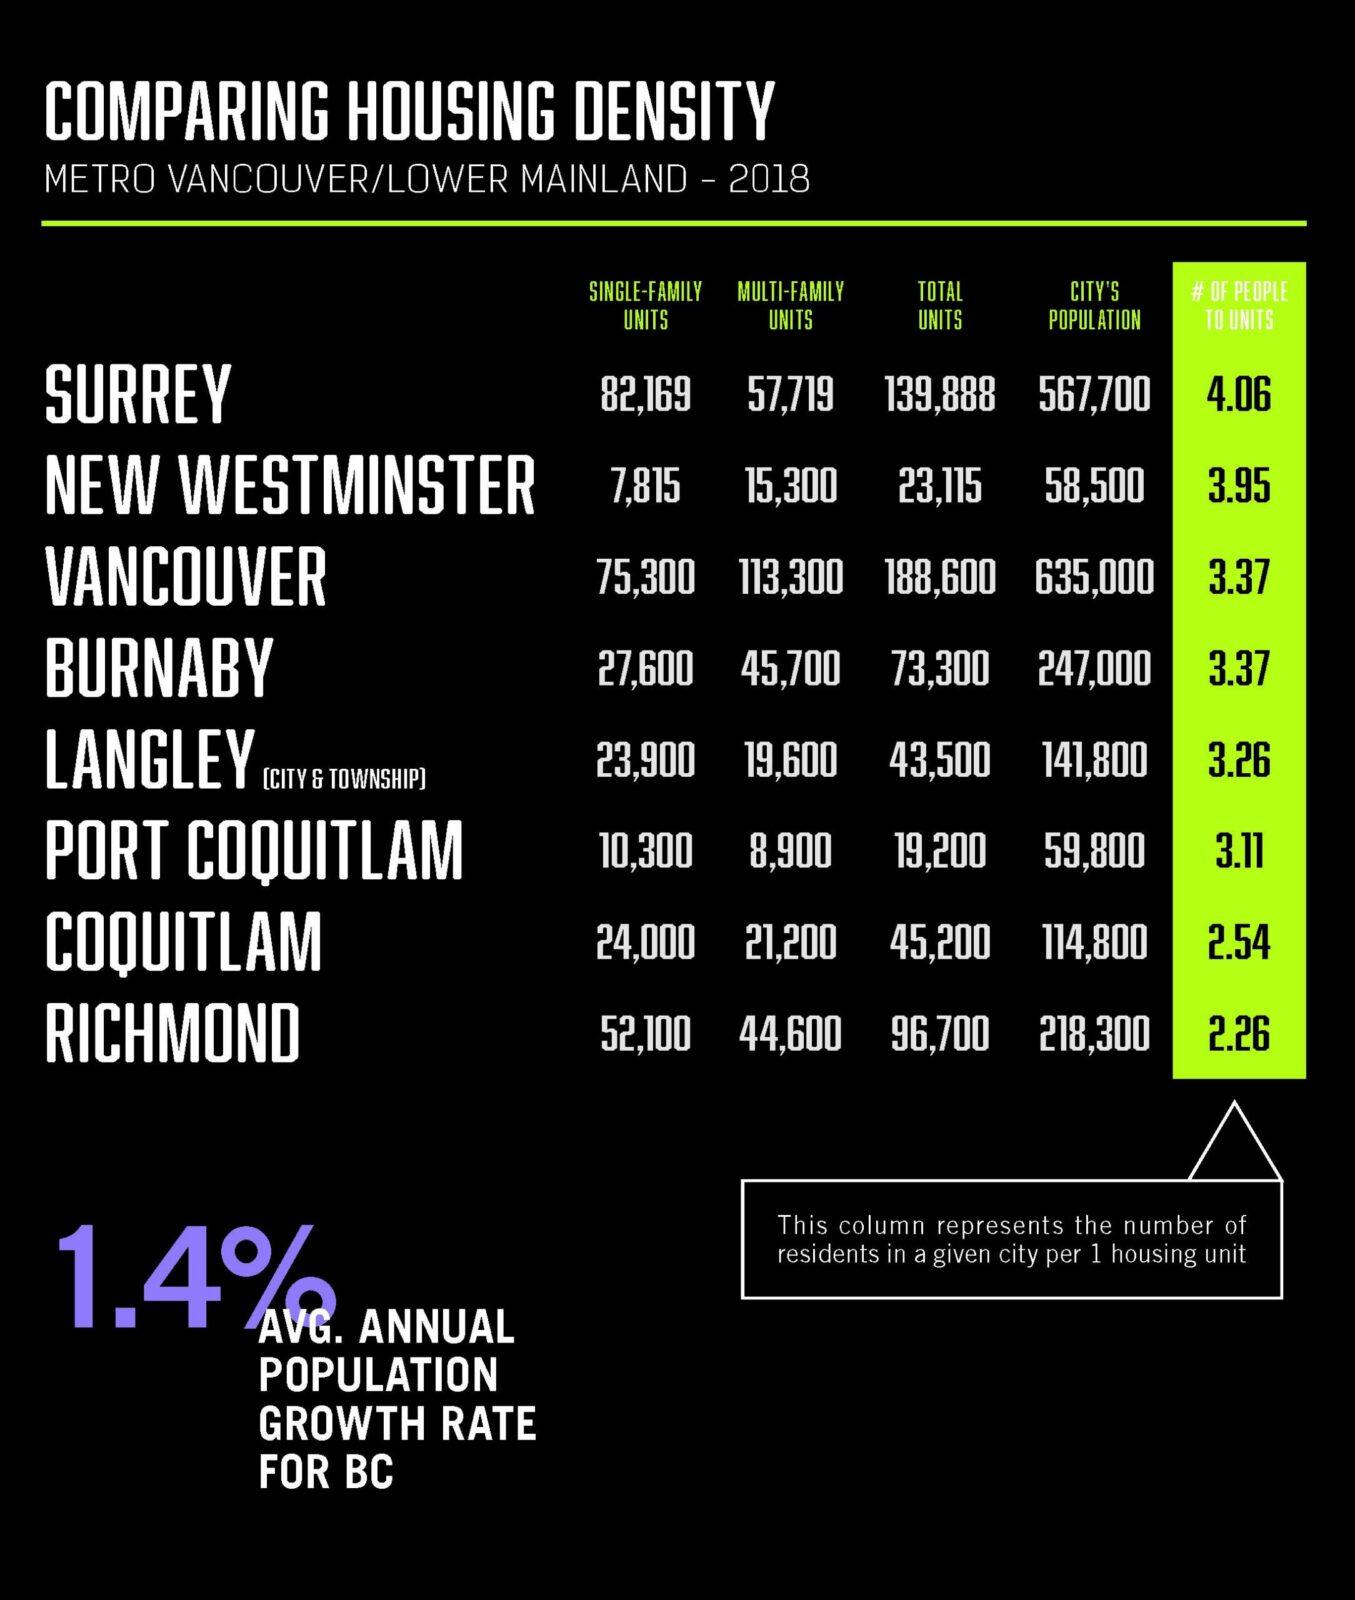 Metro Vancouver Lower Mainland HOUSING DENSITY